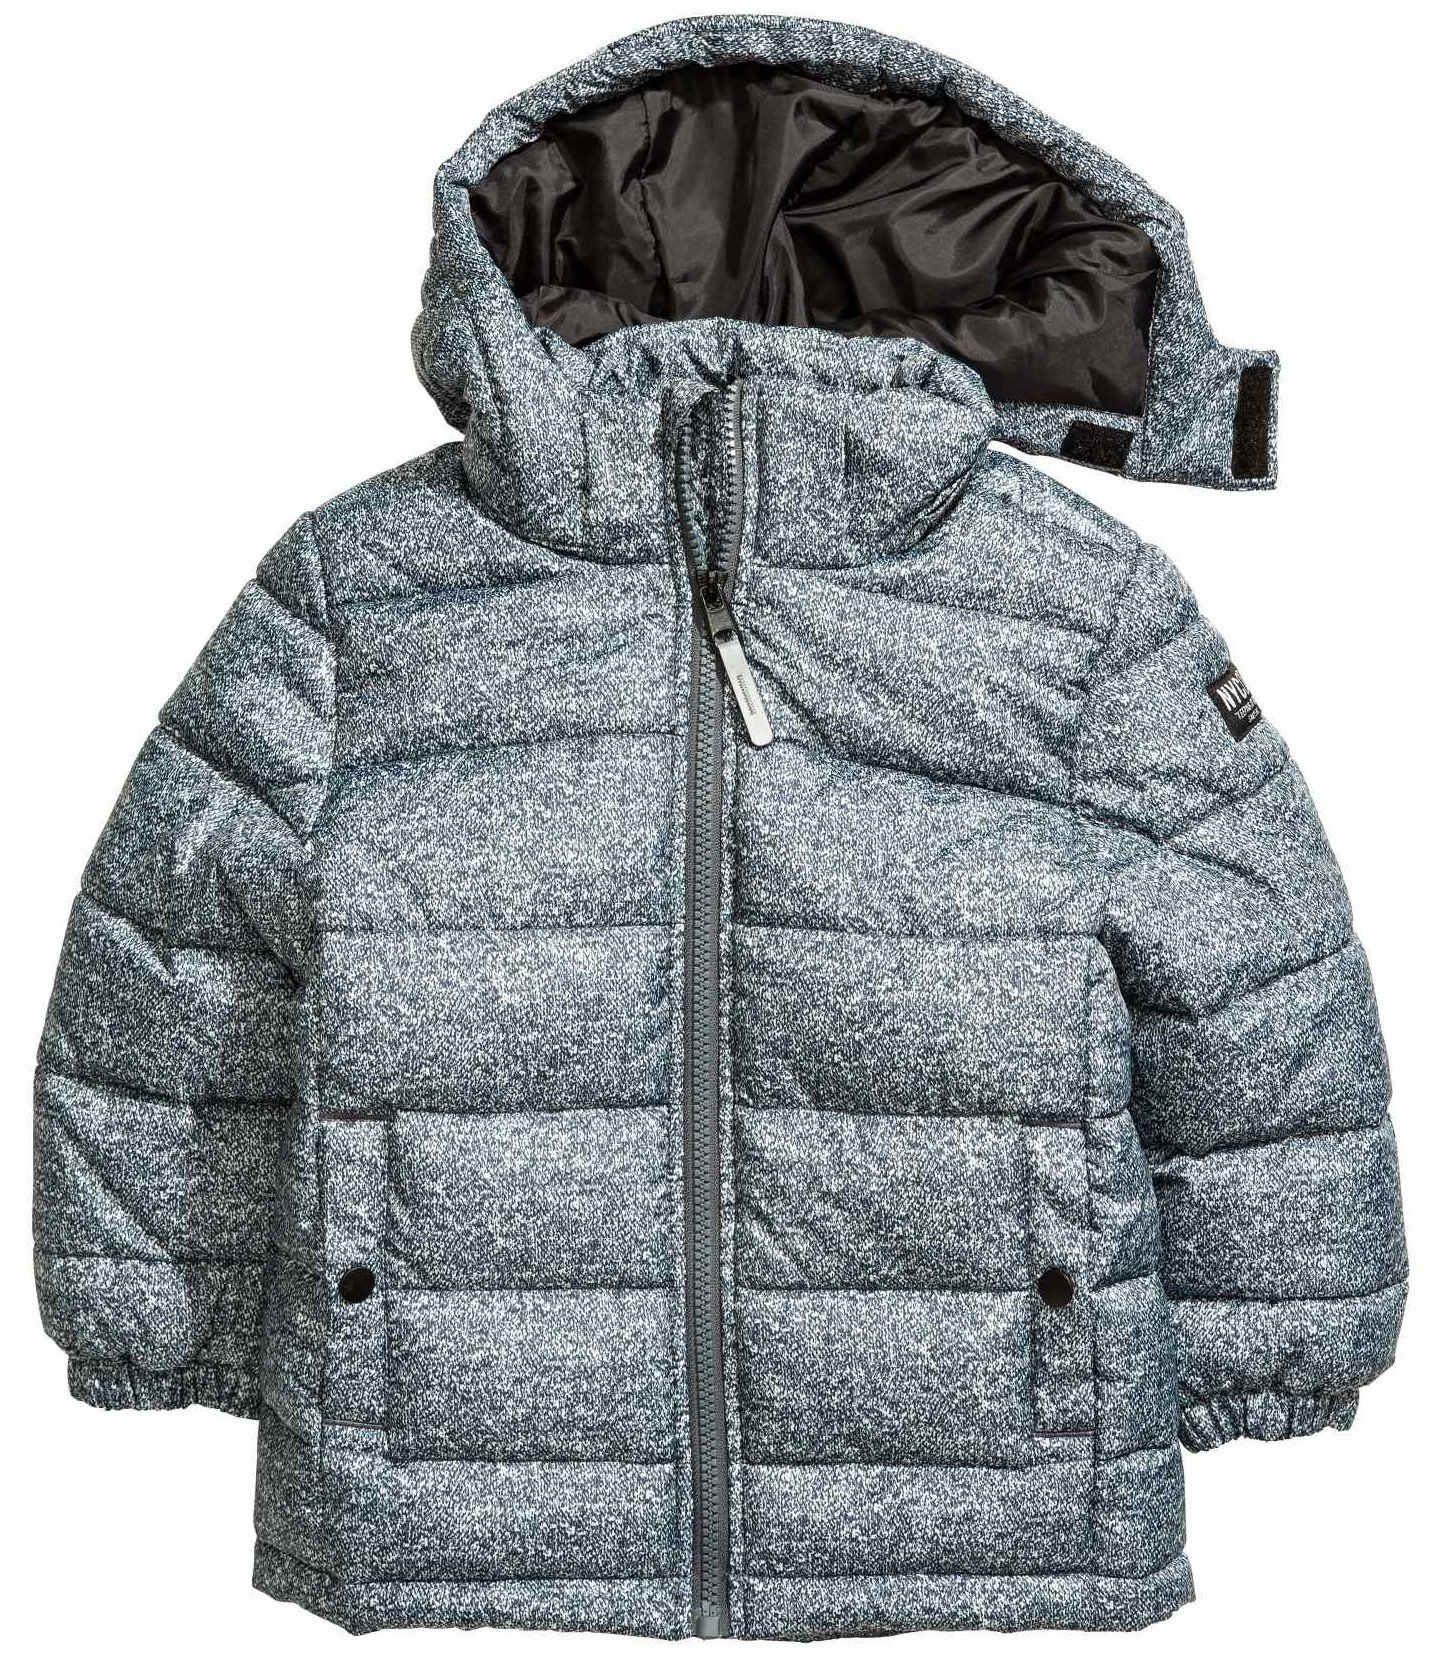 H&M zimowa MELANŻ KURTKA watowana r.128